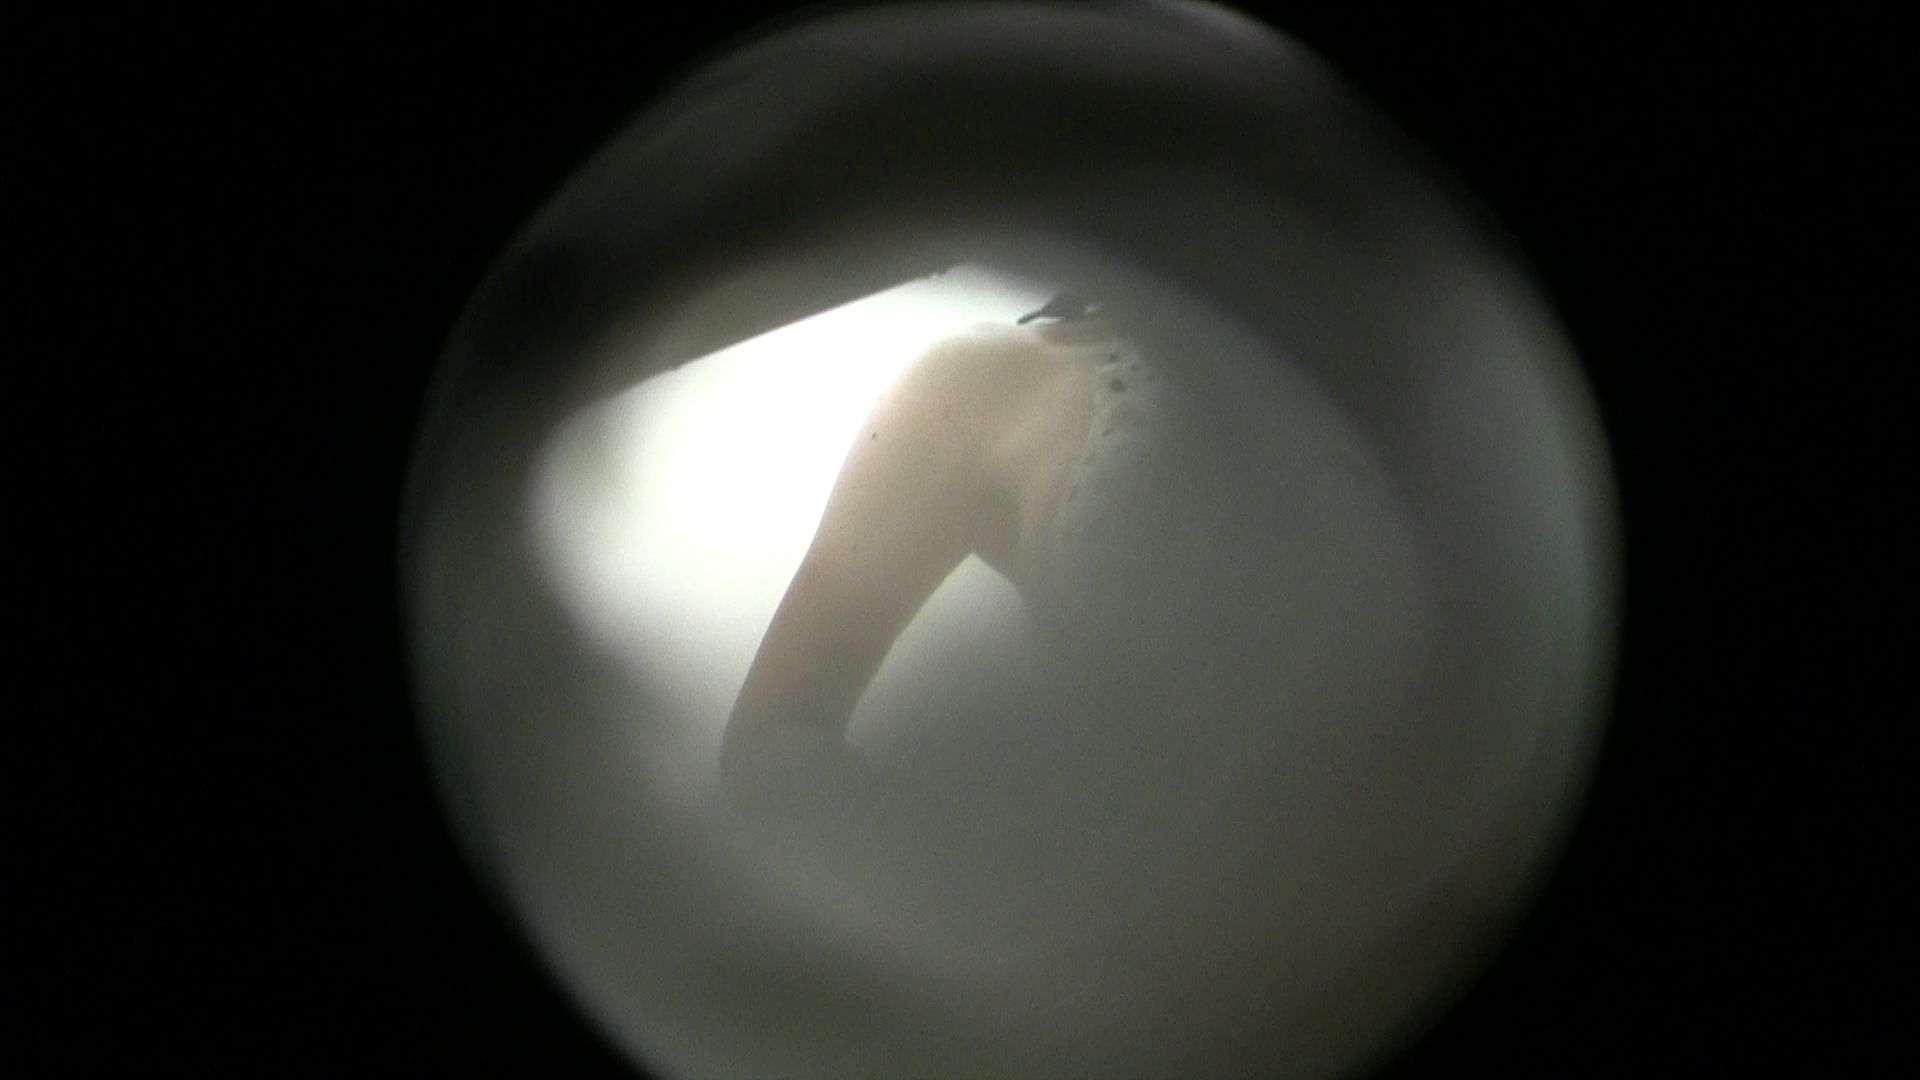 NO.35 勃起力の高い乳首を持つ年増 覗きもの AV動画キャプチャ 109枚 6